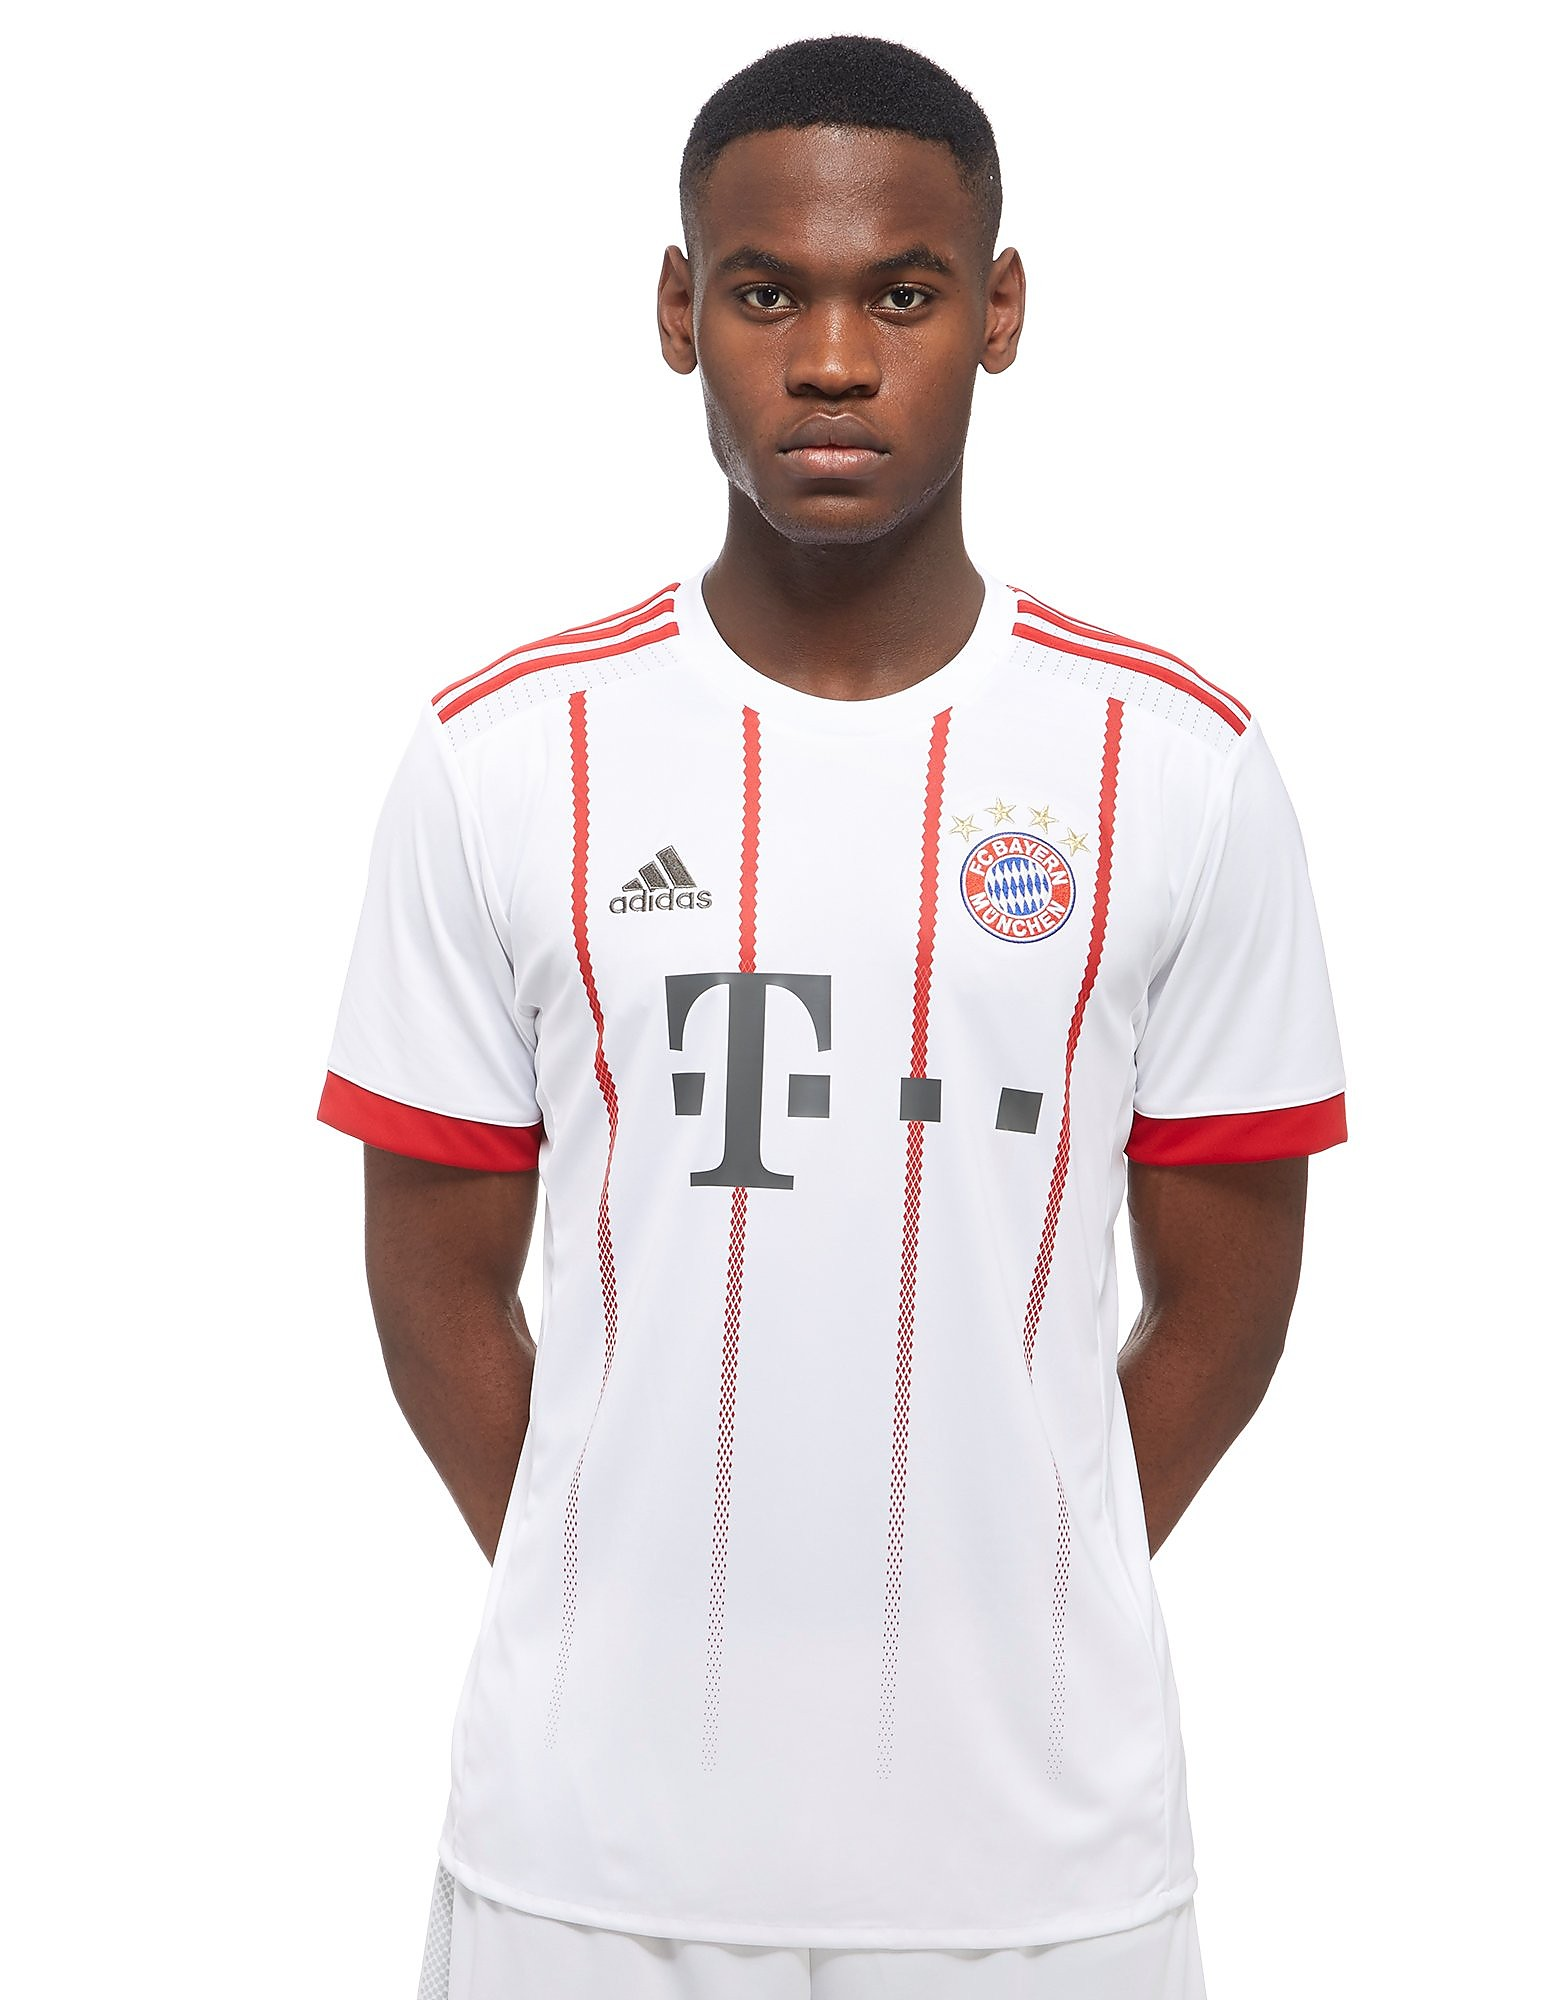 adidas FC Bayern Munich 2017/18 Third Shirt PRE ORDER